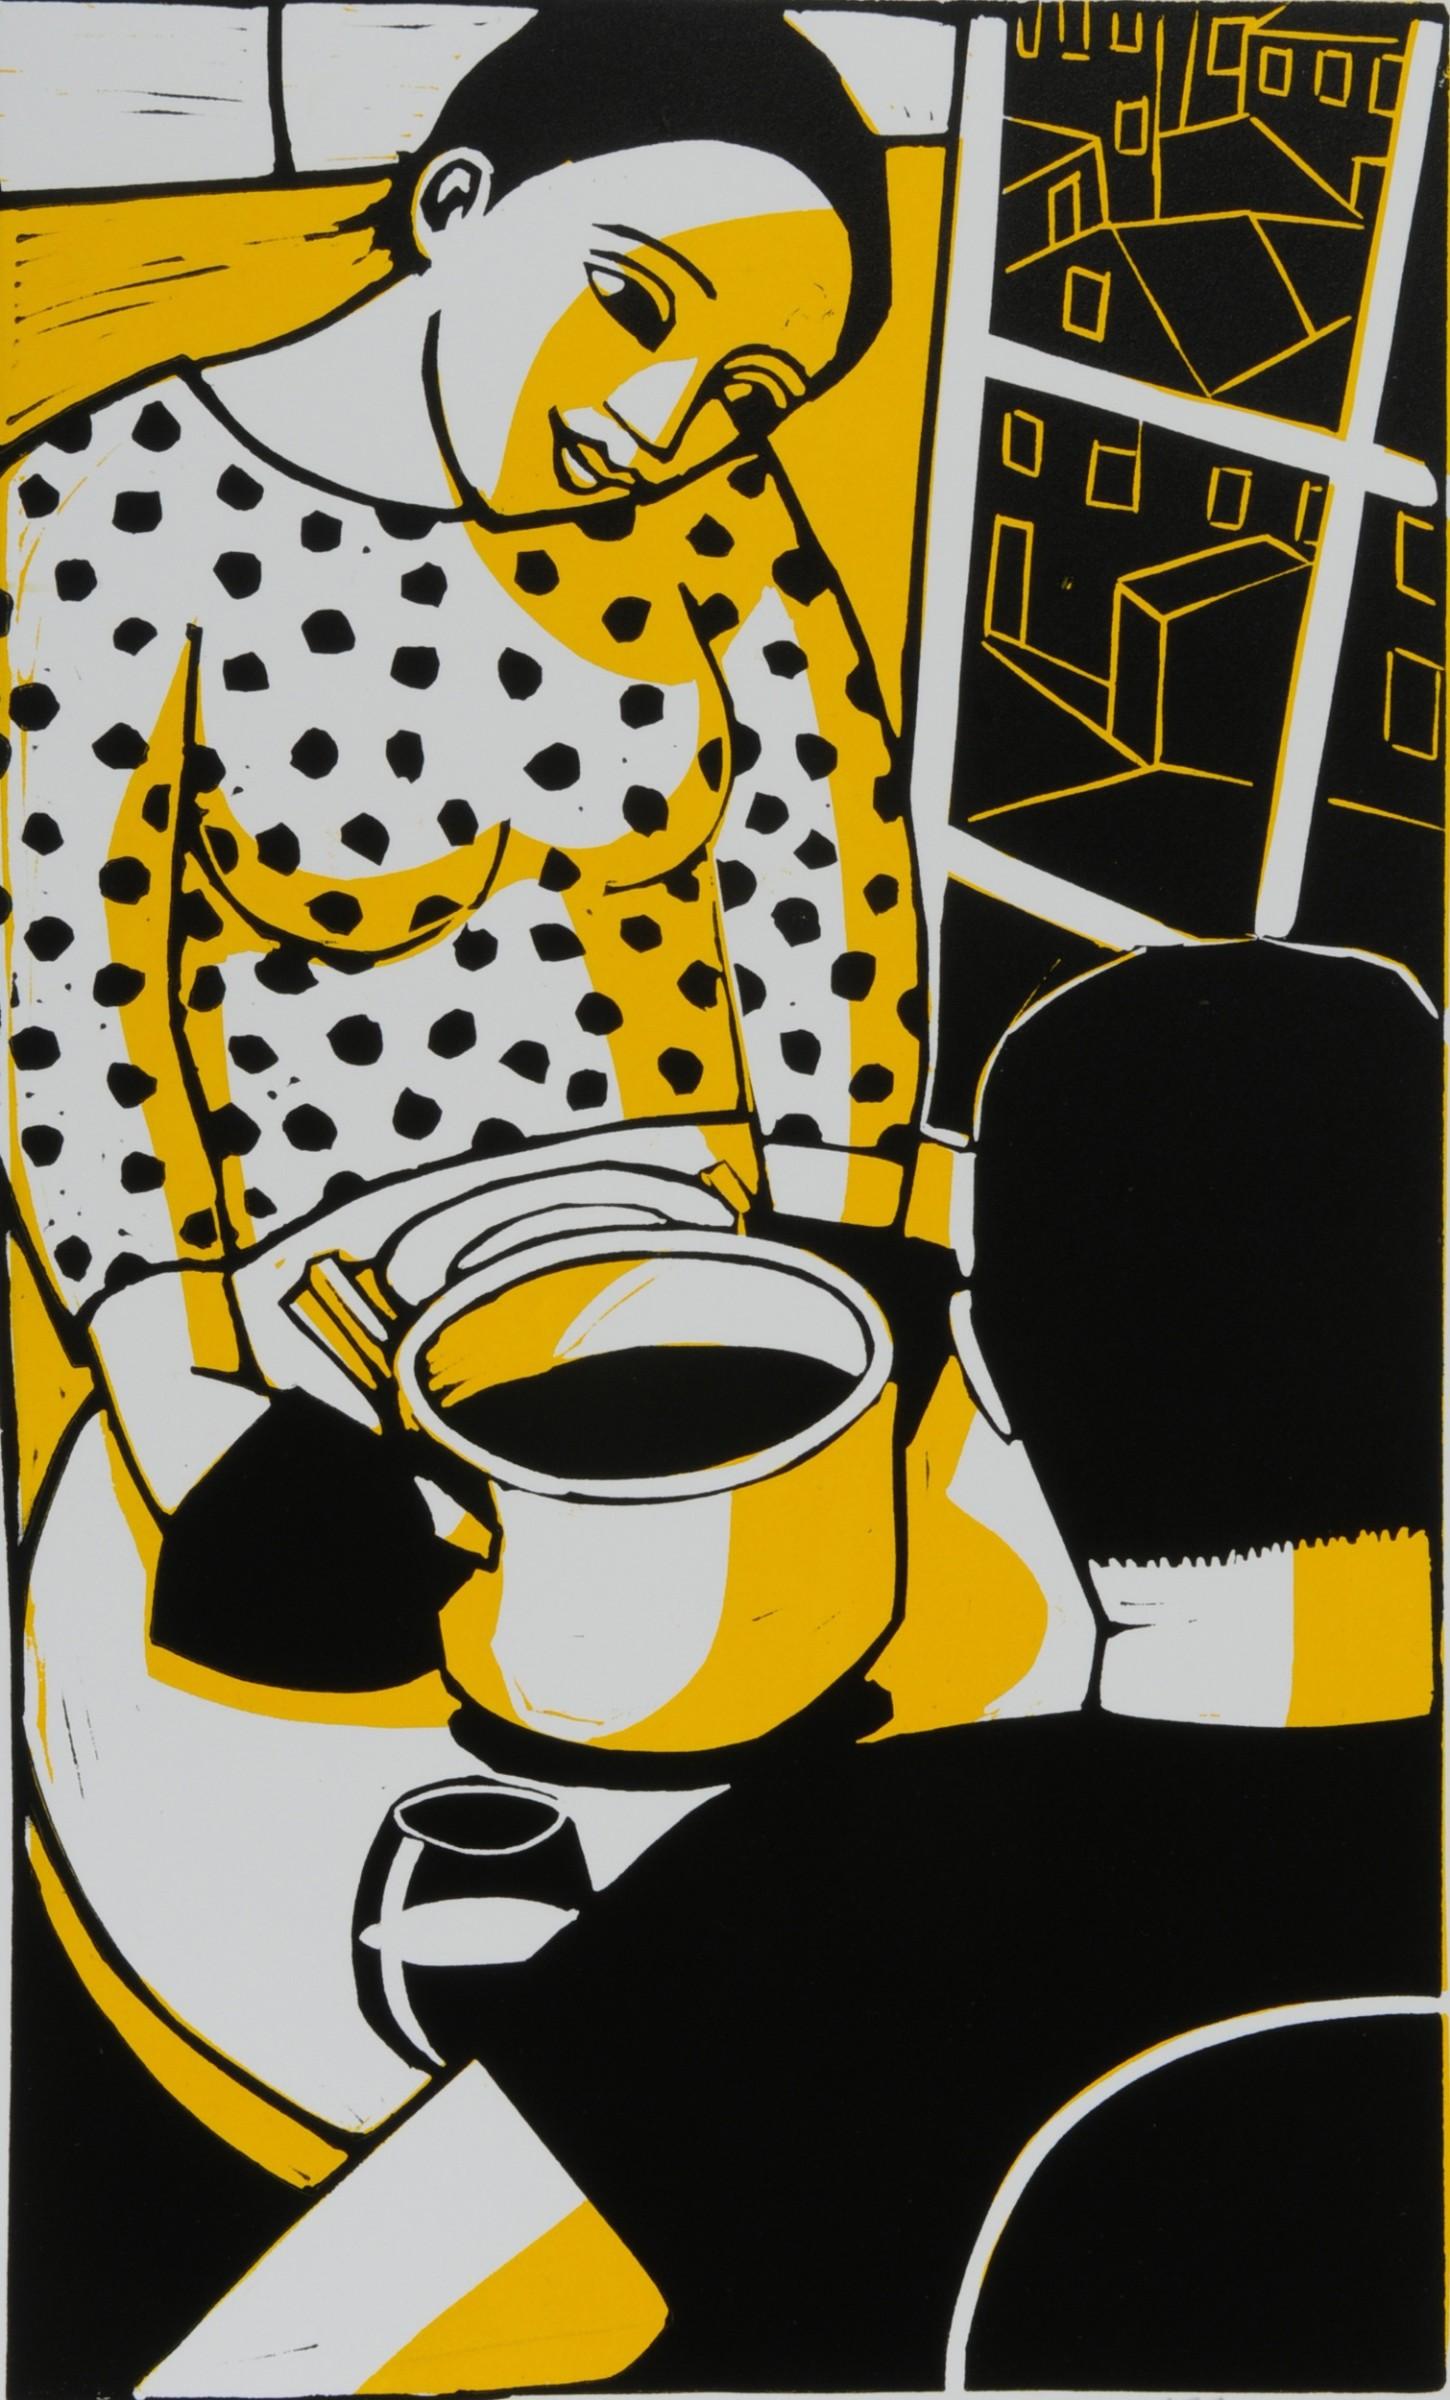 "<span class=""link fancybox-details-link""><a href=""/exhibitions/23/works/artworks_standalone11268/"">View Detail Page</a></span><div class=""artist""><span class=""artist""><strong>Anita Klein PPRE Hon RWS</strong></span></div><div class=""title""><em>Dinner in Winter</em></div><div class=""medium"">linocut</div><div class=""dimensions"">56 x 40cm paper size<br>38 x 22.5cm image size</div><div class=""edition_details"">edition of 50</div>"